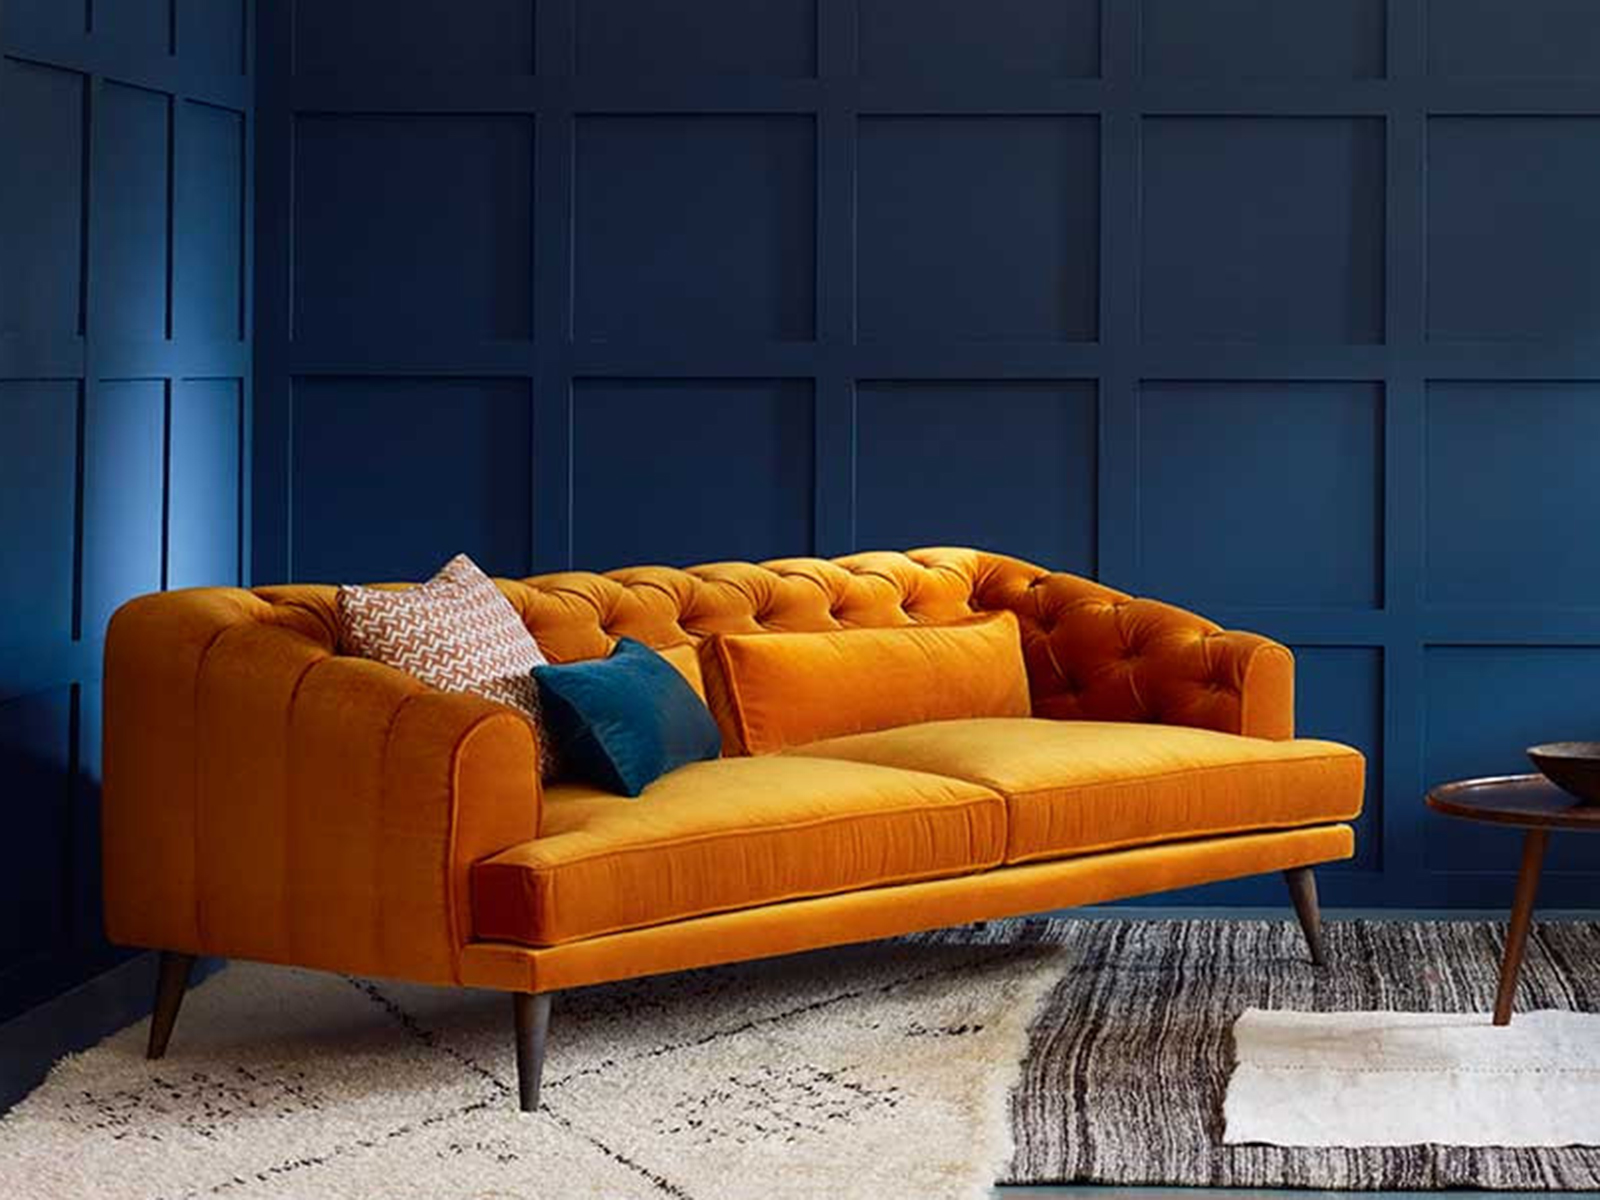 sofa. +110 Unique Living Room Furniture Pieces That Amaze Everyone